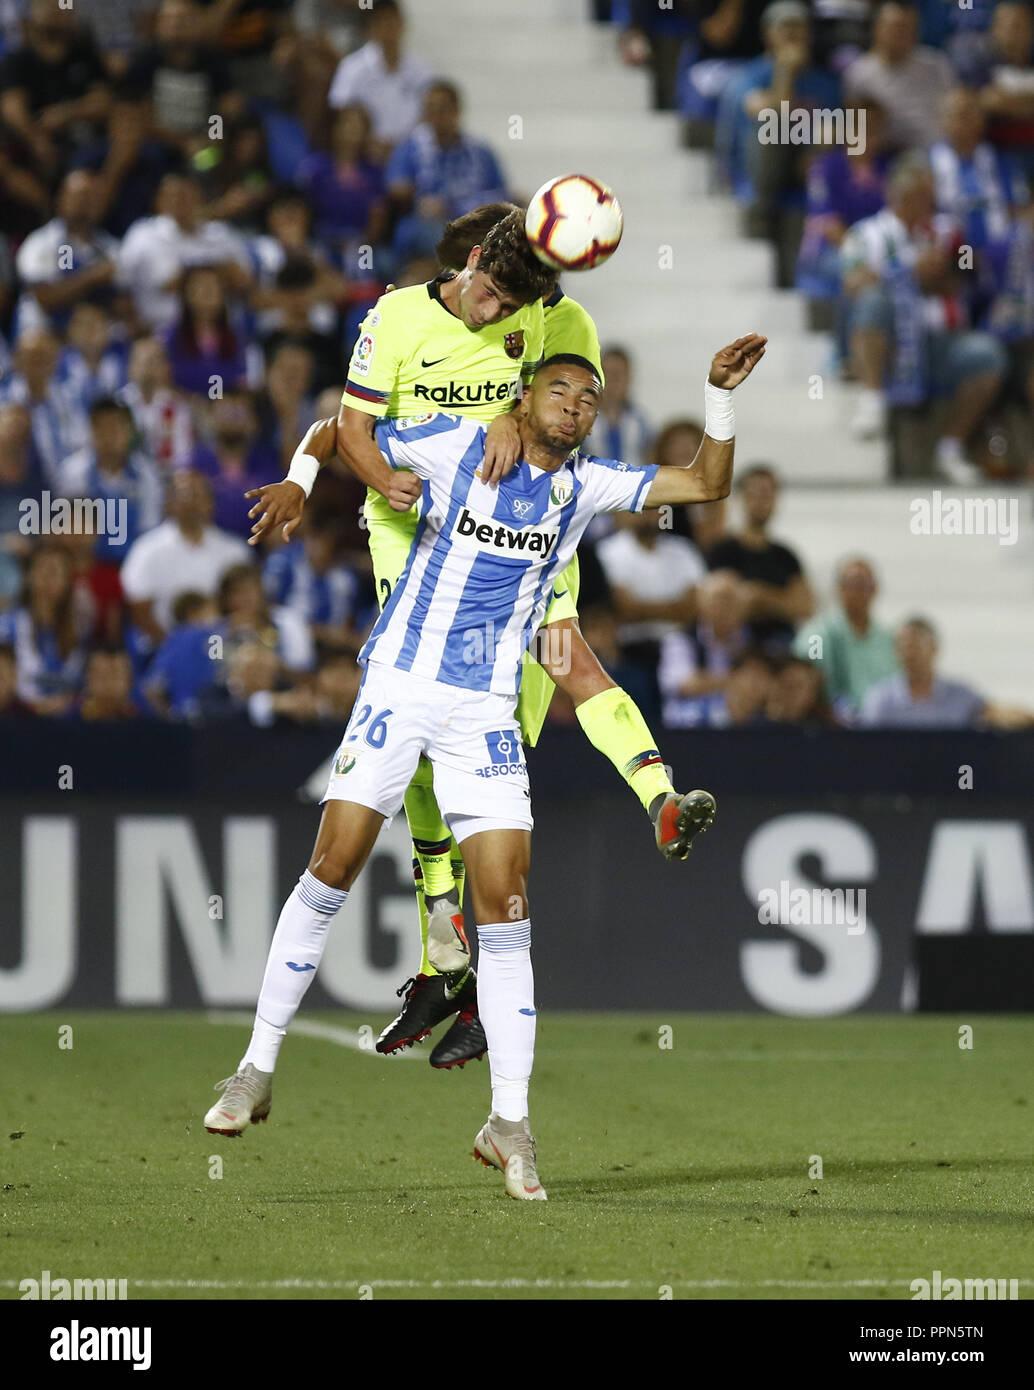 Sergi Roberto During Match Between Imágenes De Stock   Sergi Roberto ... 2e4710b0edff7